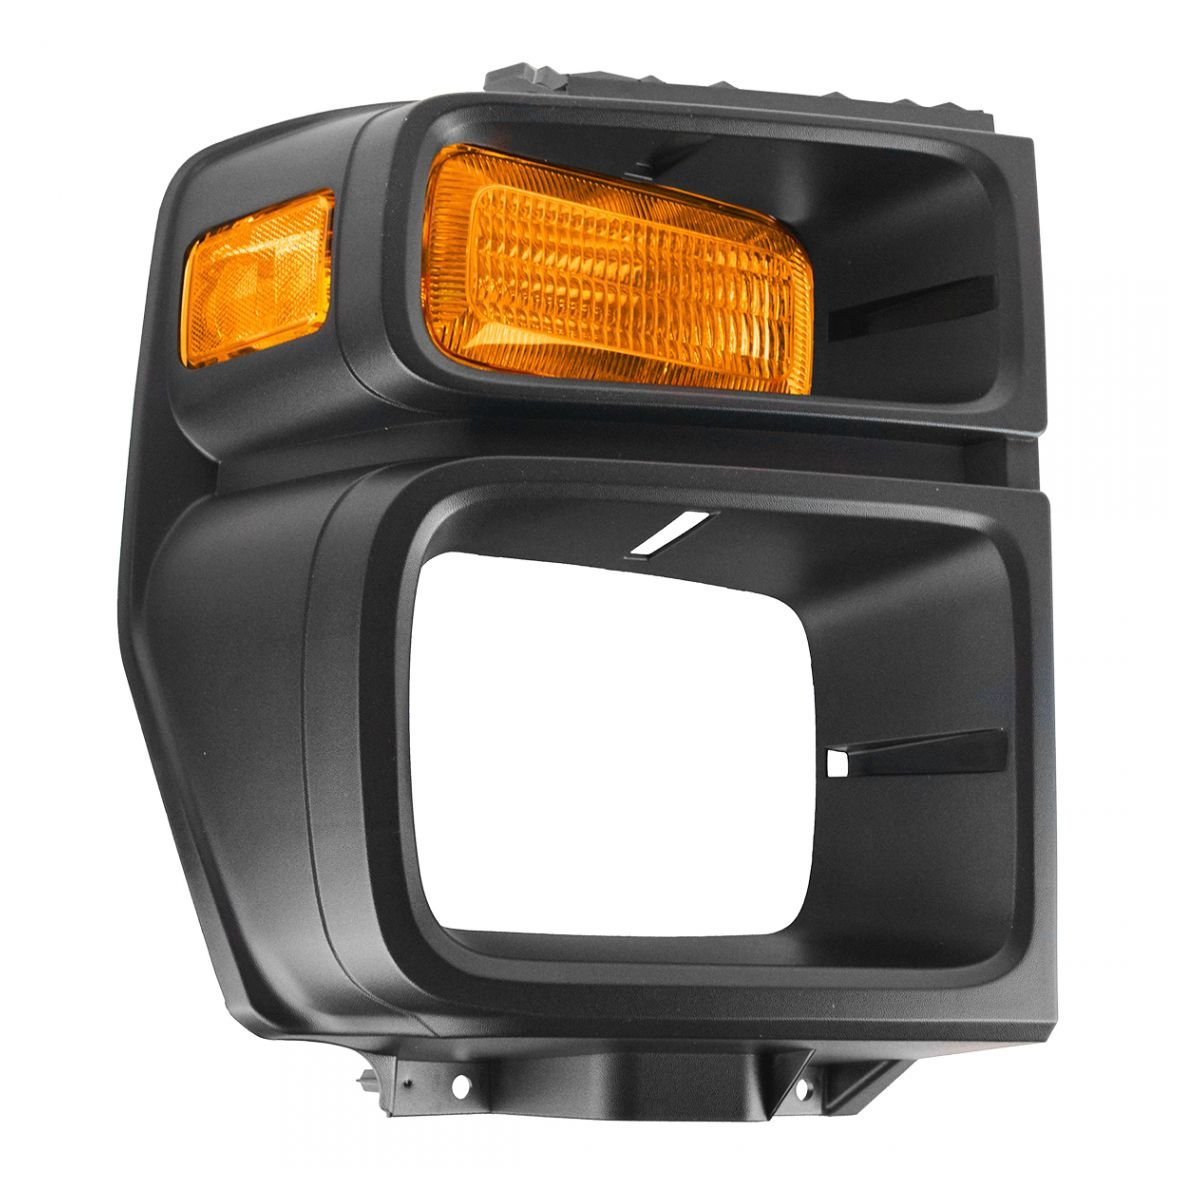 Headlight Trim Bezel w/Parking Turn Signal Light Lamp Passenger Right for E150 AM Autoparts